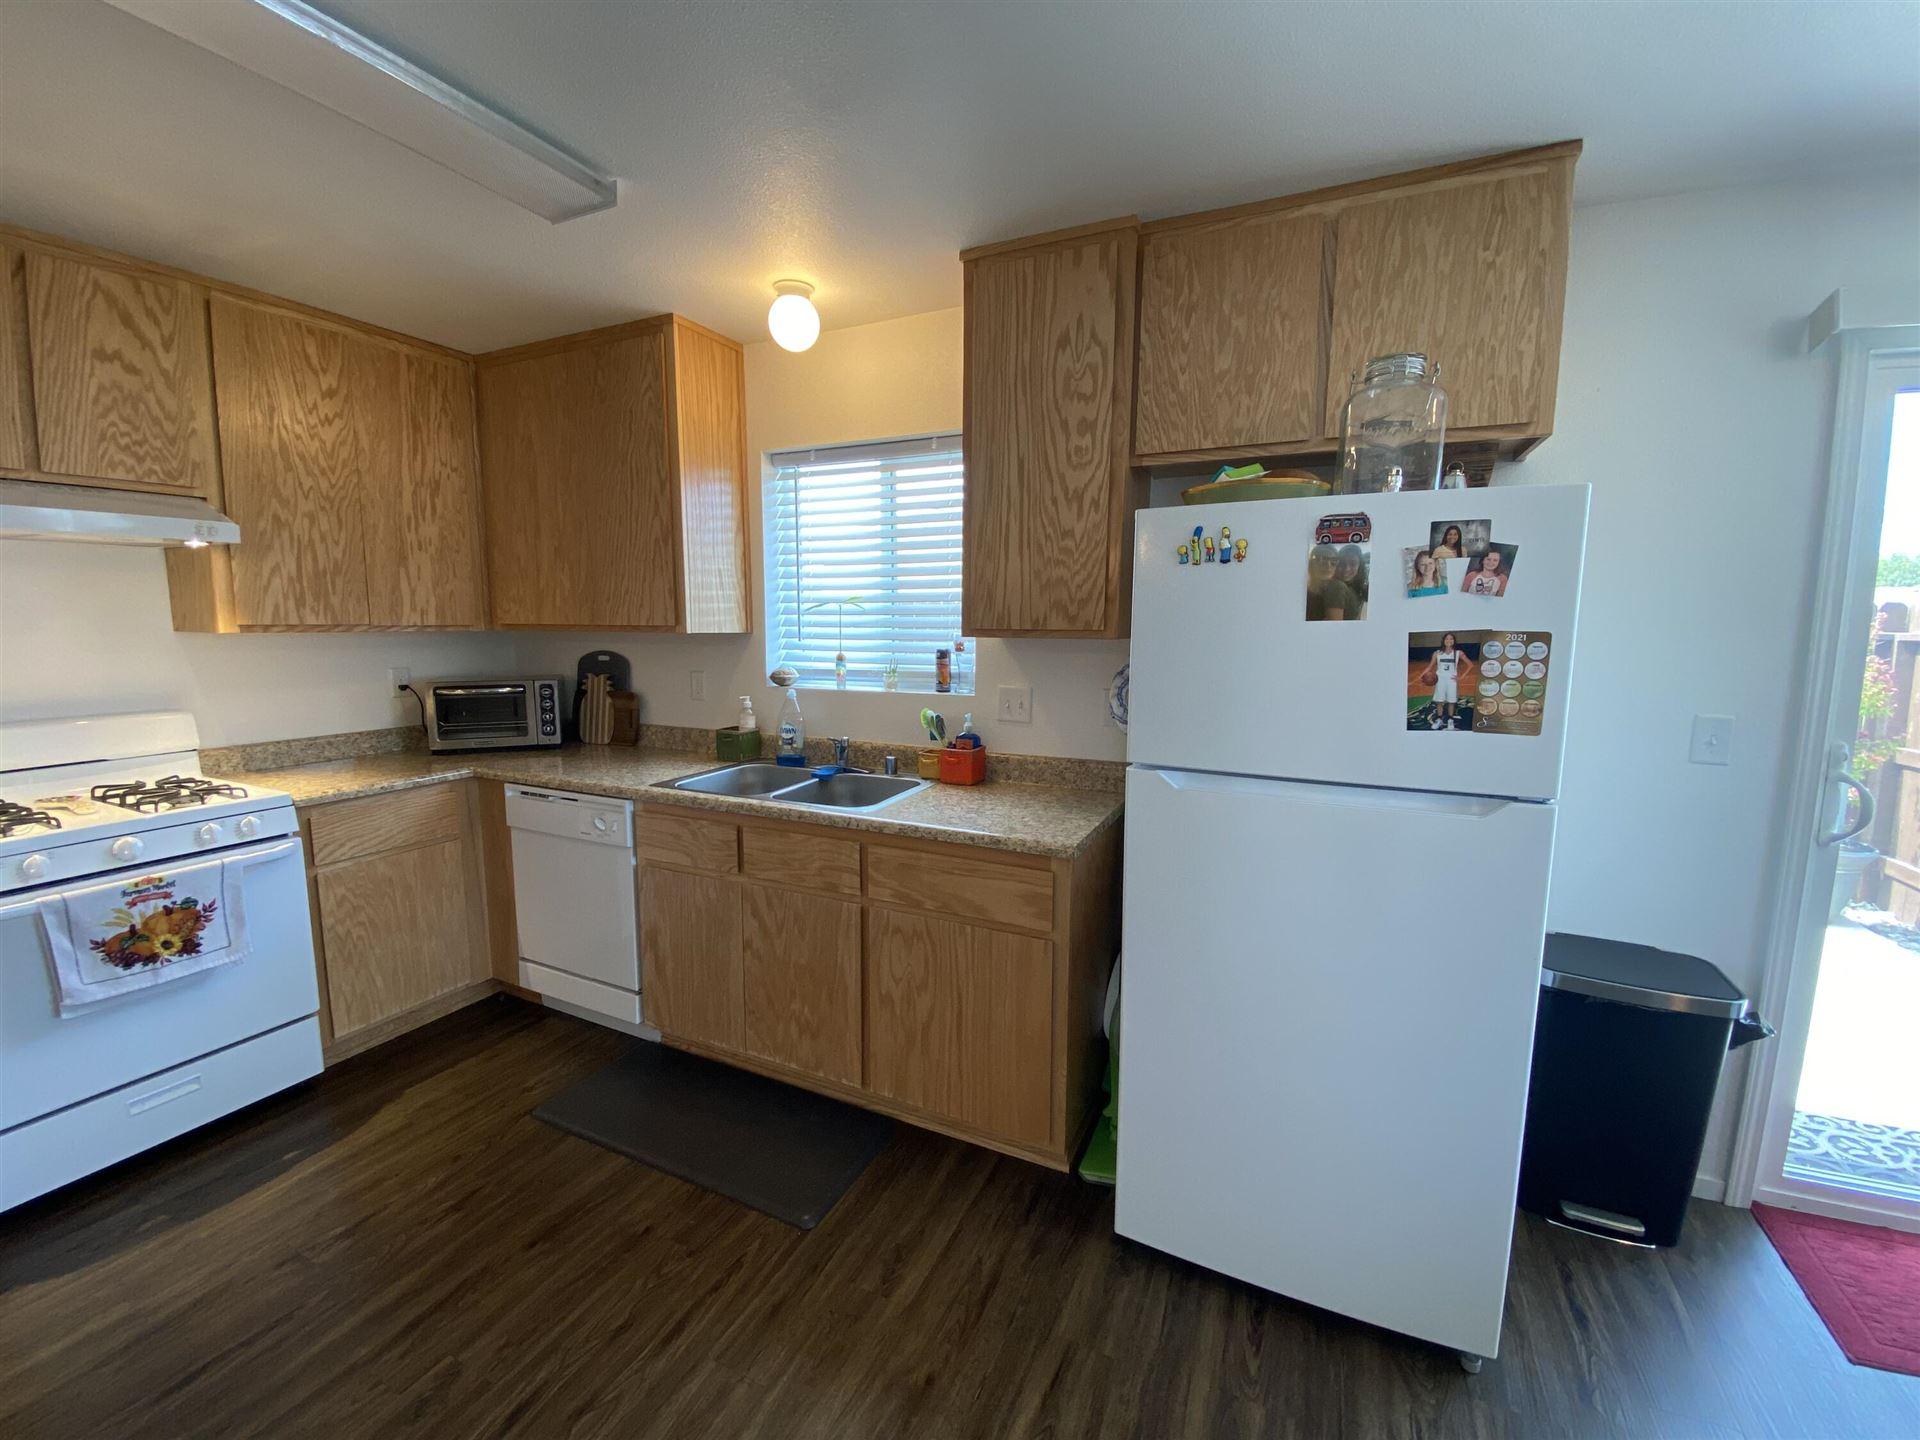 Photo of 20955 Beagle St, Cottonwood, CA 96022 (MLS # 21-4751)